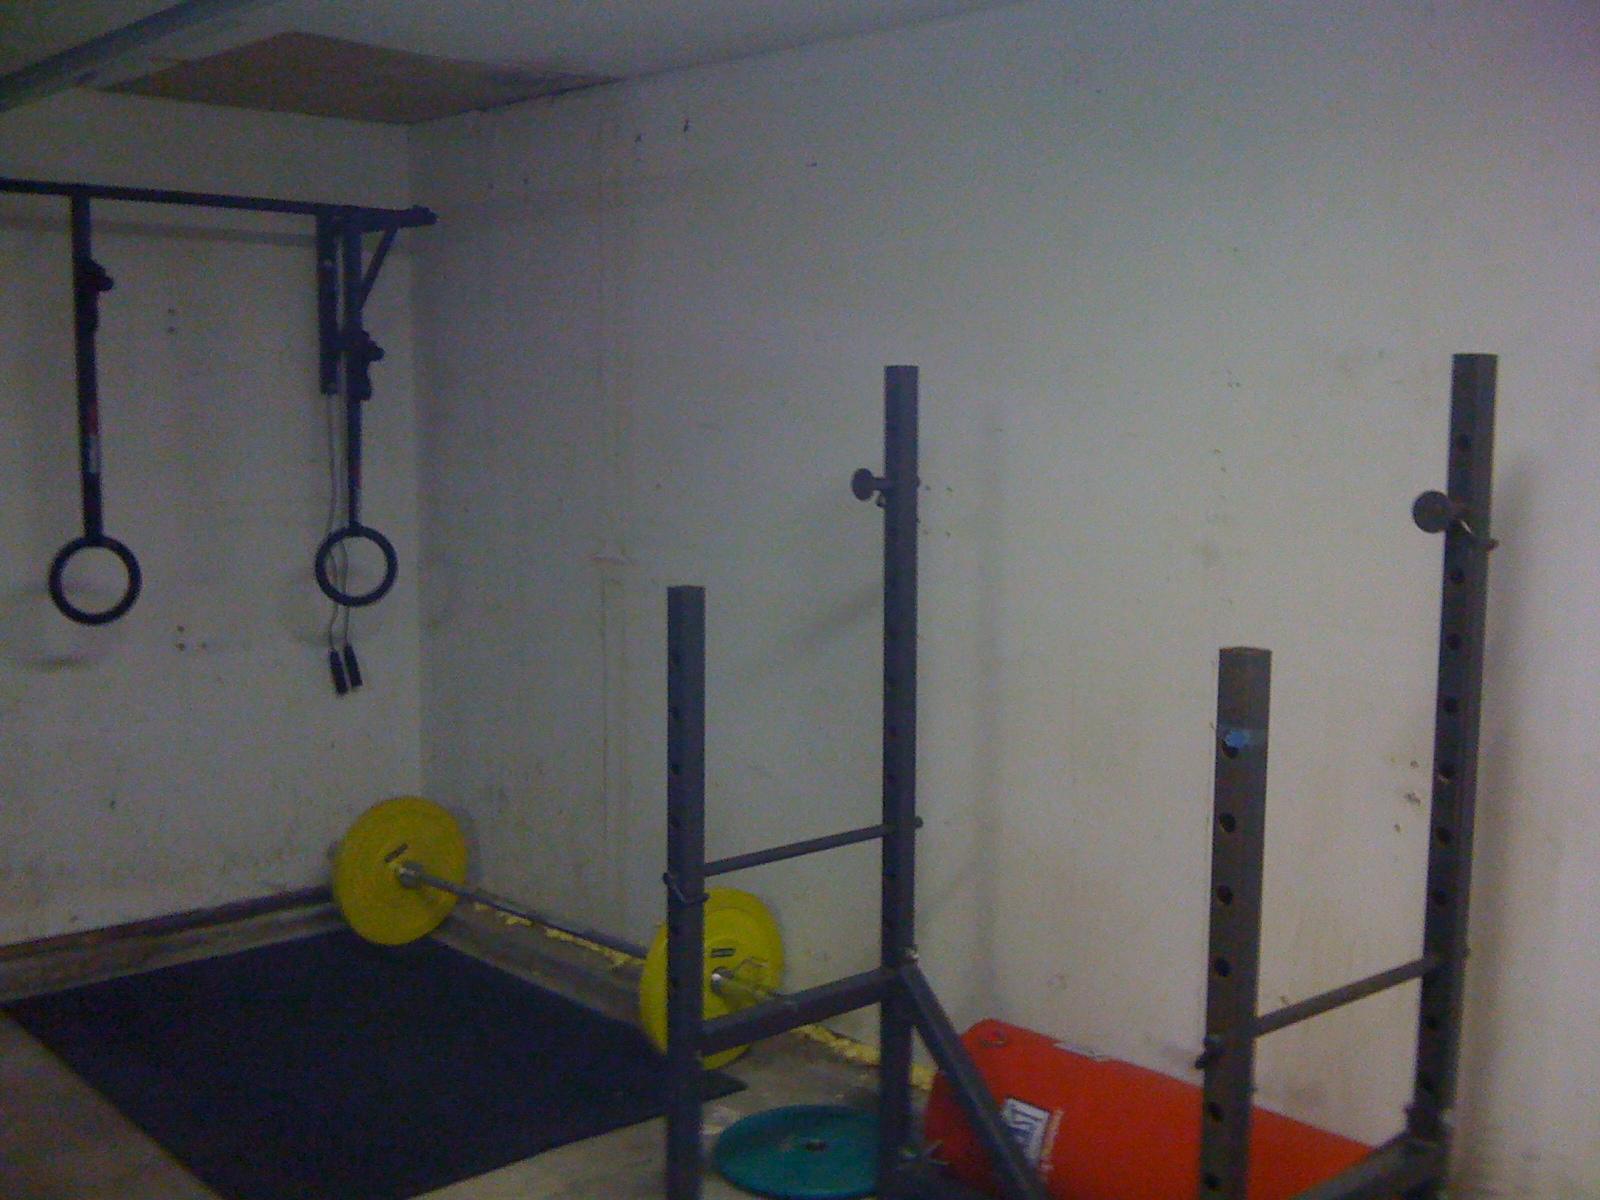 Garage gym 2 : smart shopping reepicheeps coracle